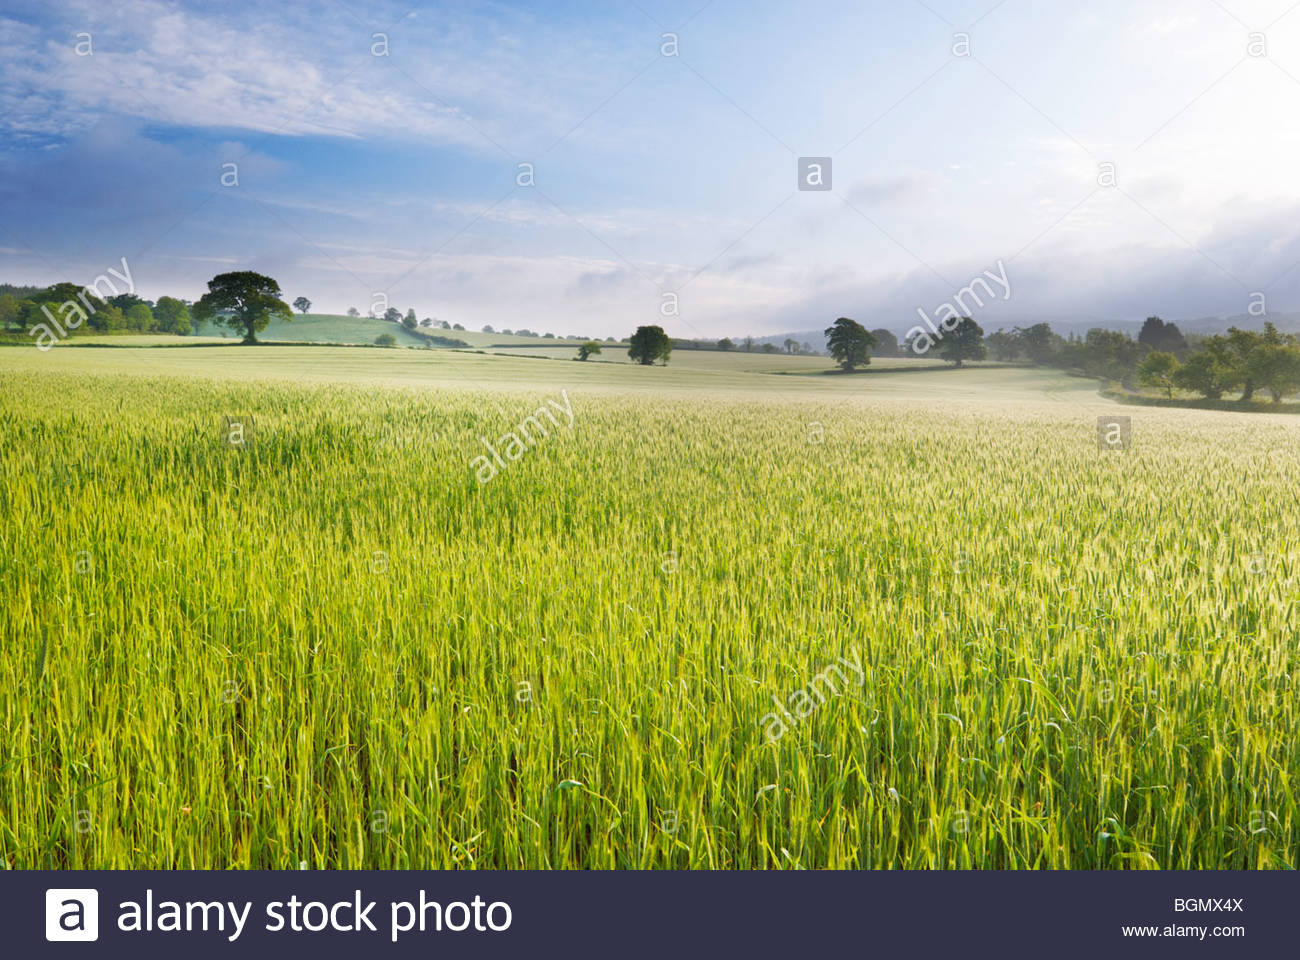 Campo de trigo, cerca de Budleigh Salterton, East Devon, Inglaterra. Imagen De Stock